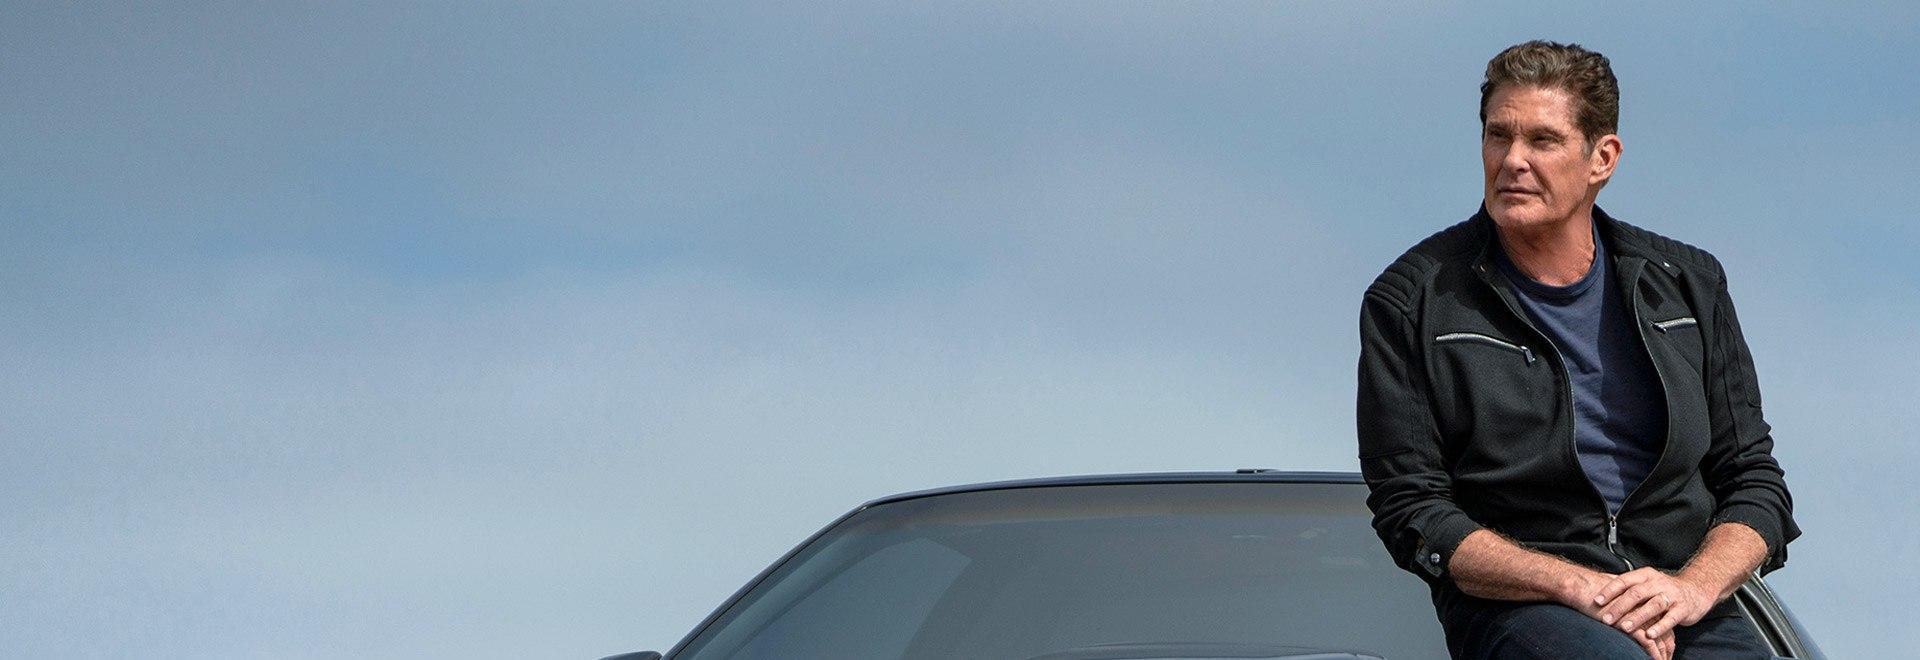 David Hasselhoff: Supercars anni '80